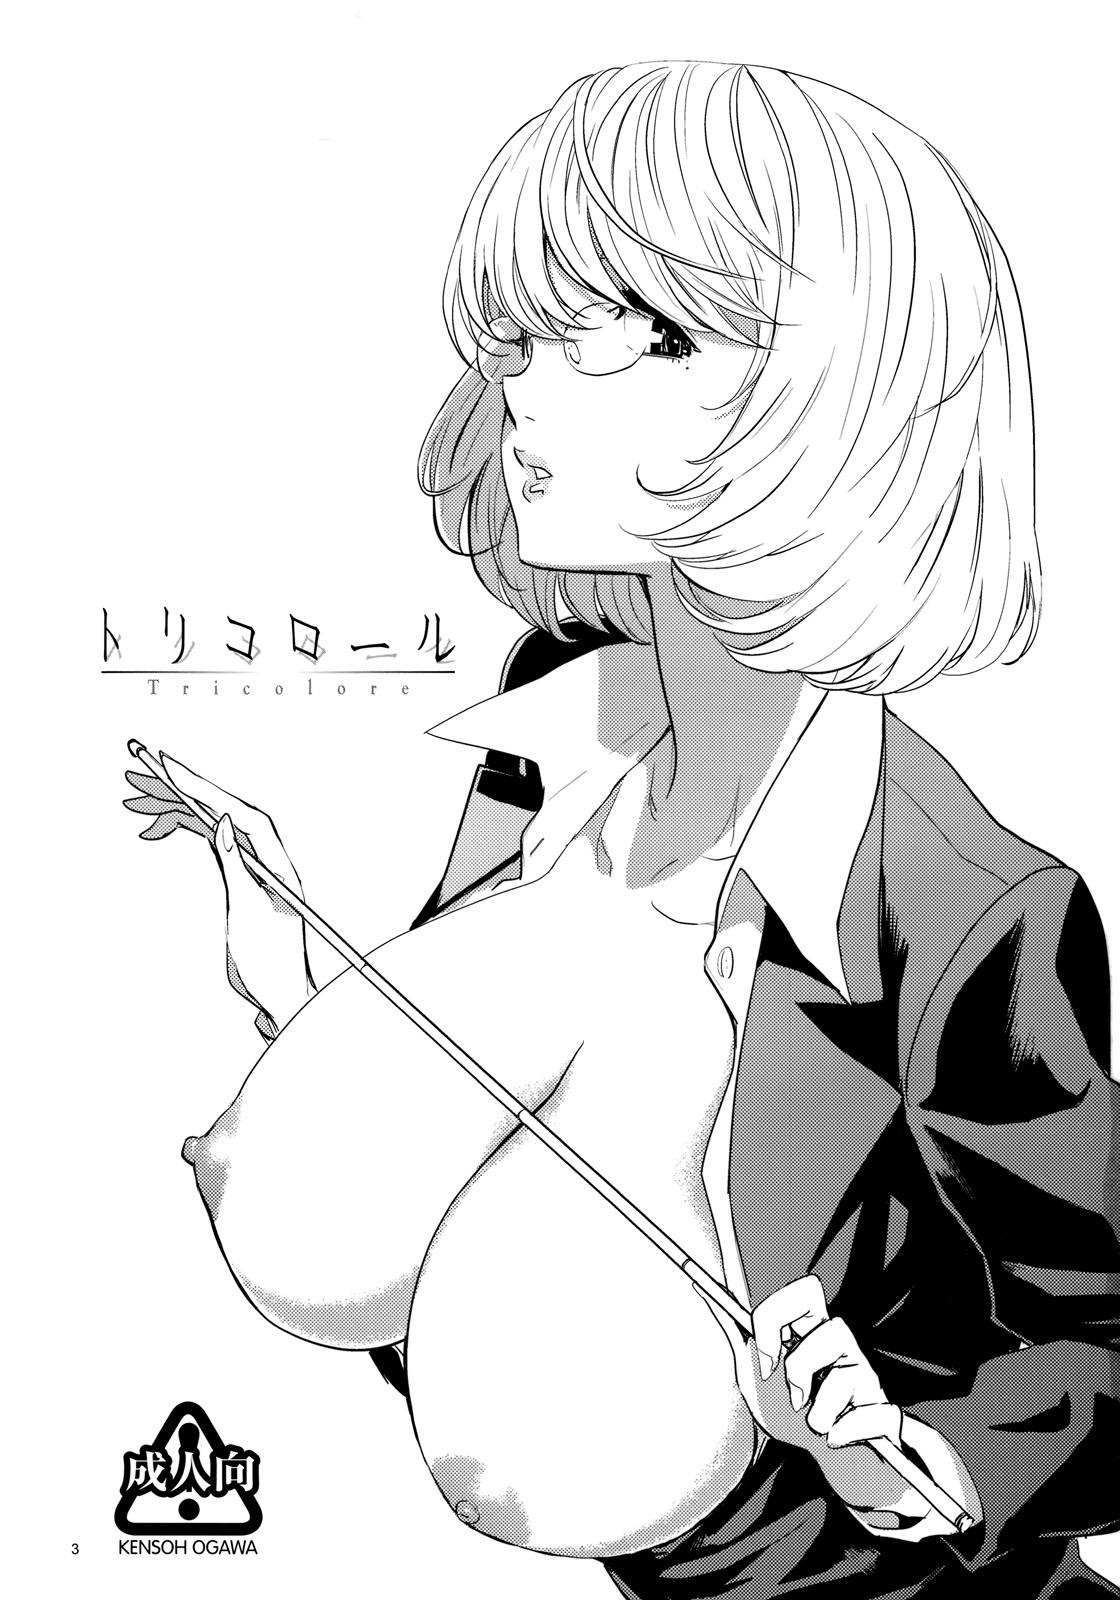 DoujinReader.com Tricolore_trico_03